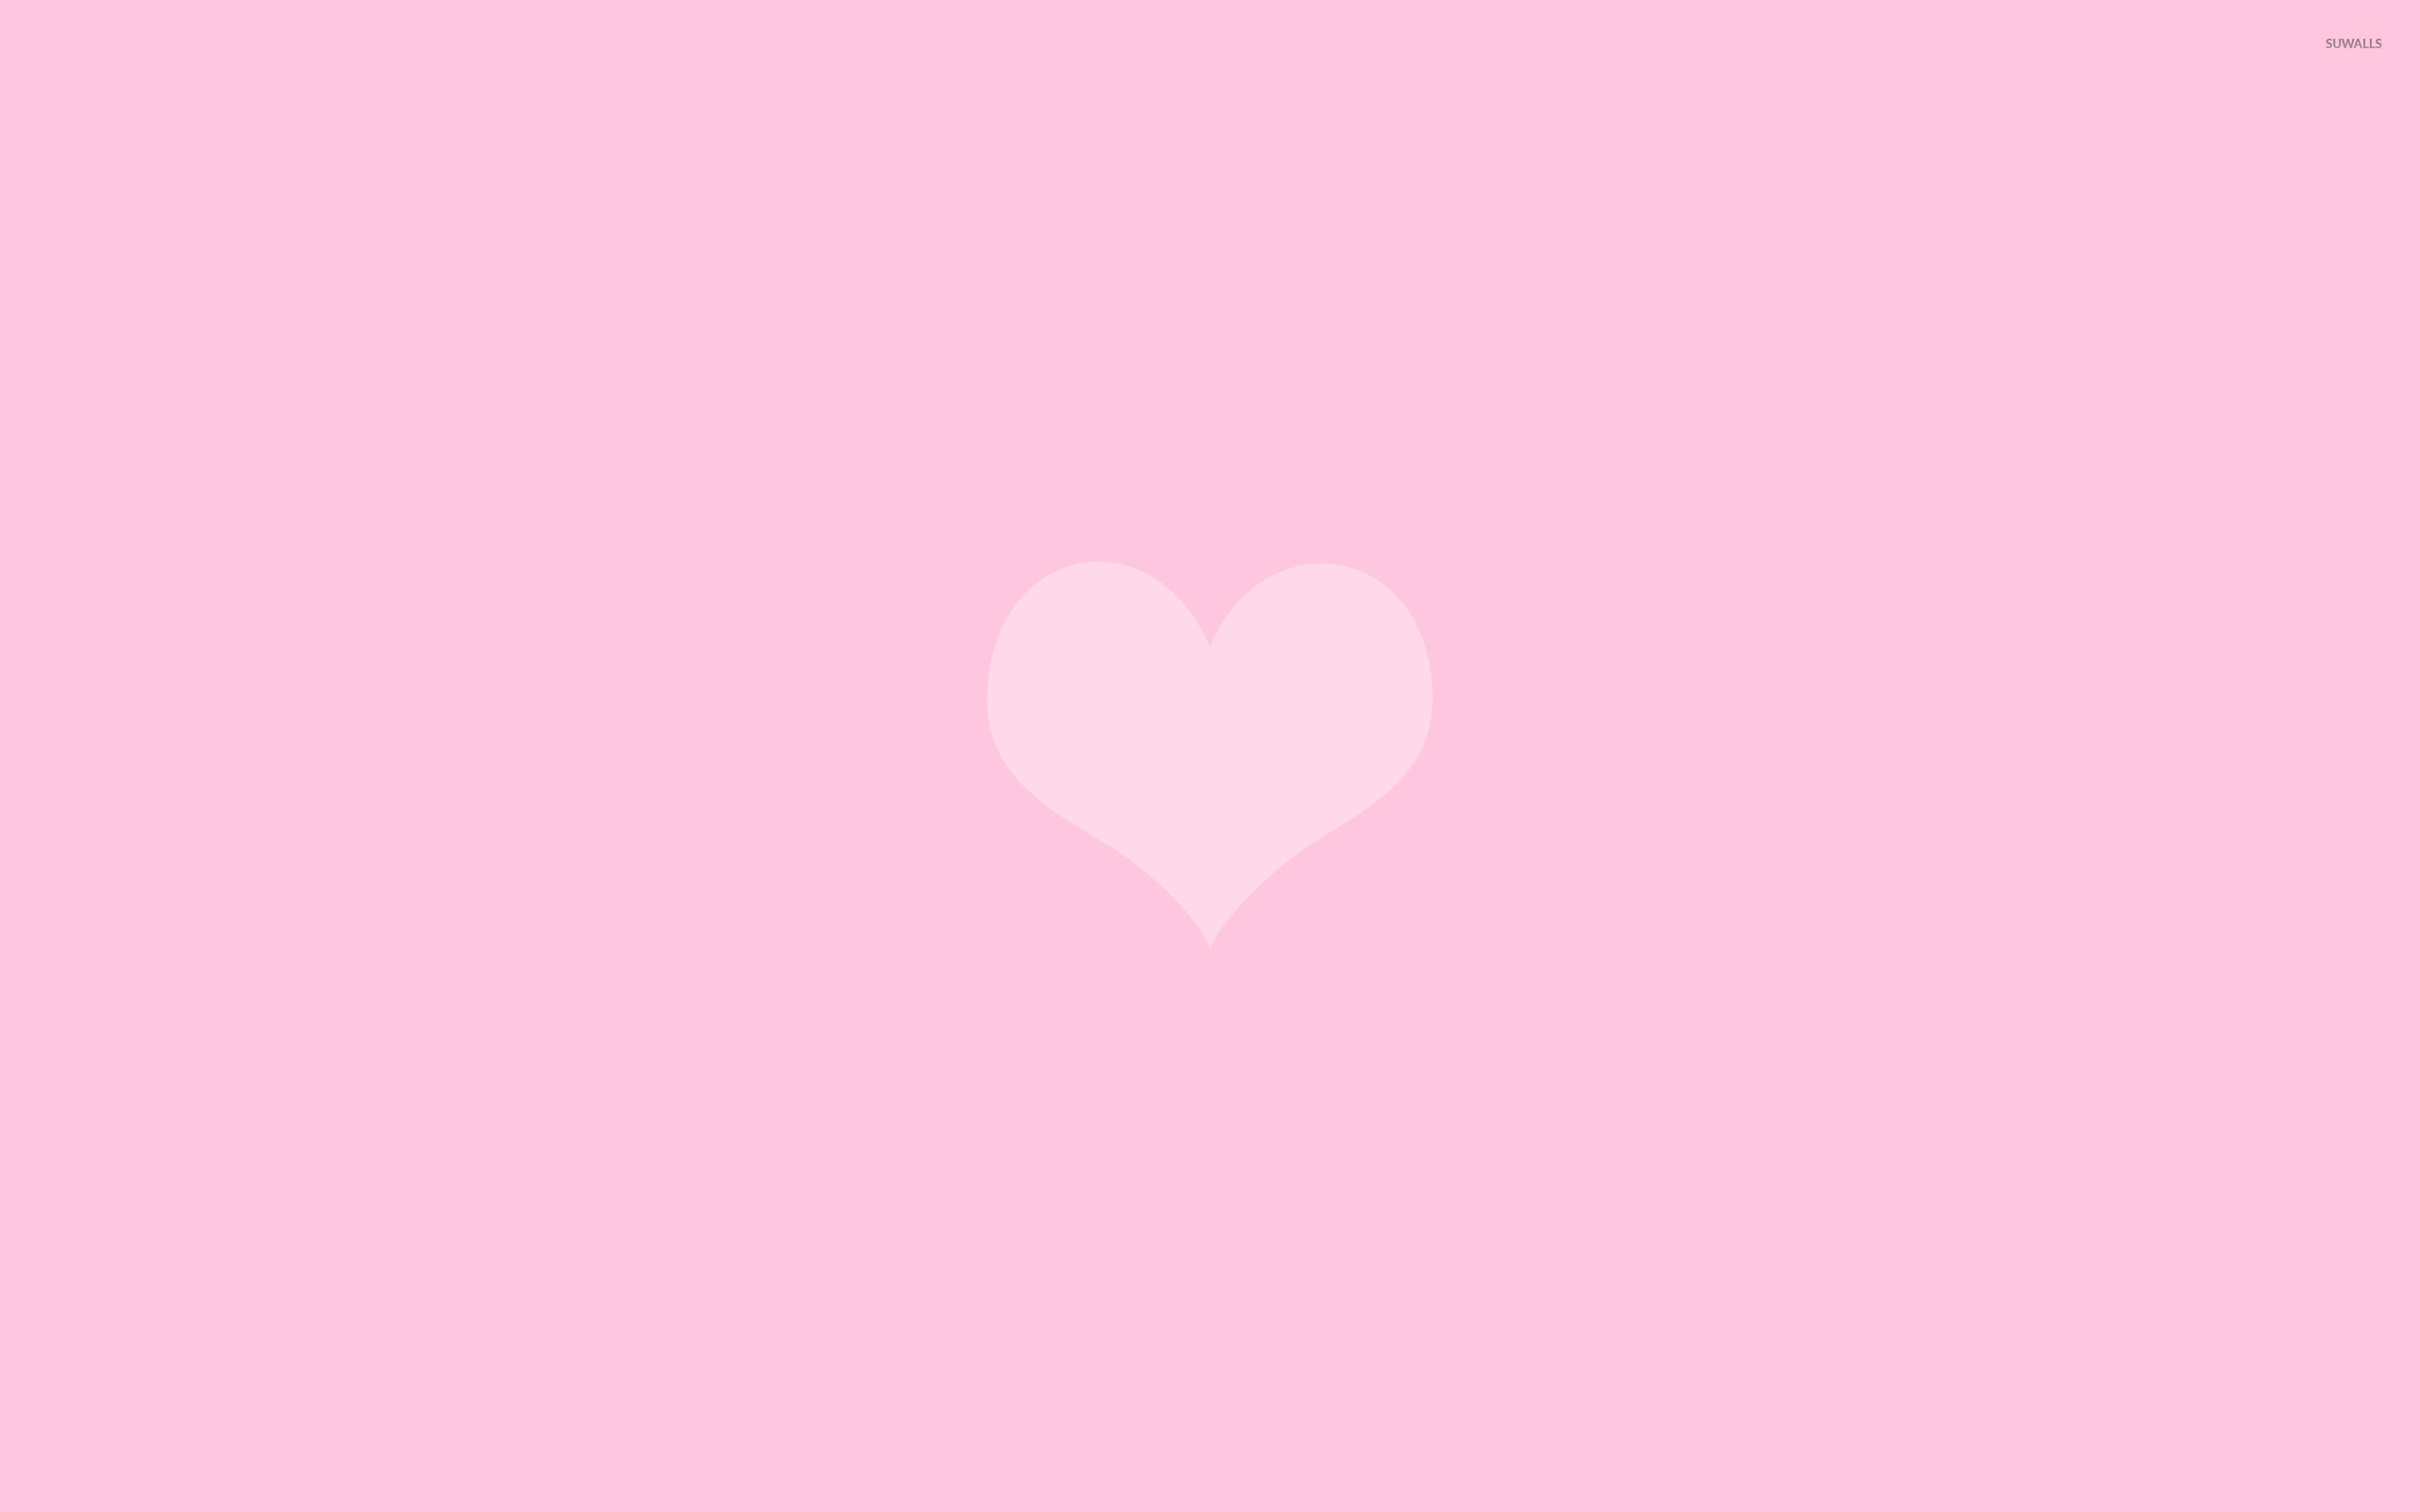 Pink heart 3 wallpaper - Minimalistic wallpapers - #43736